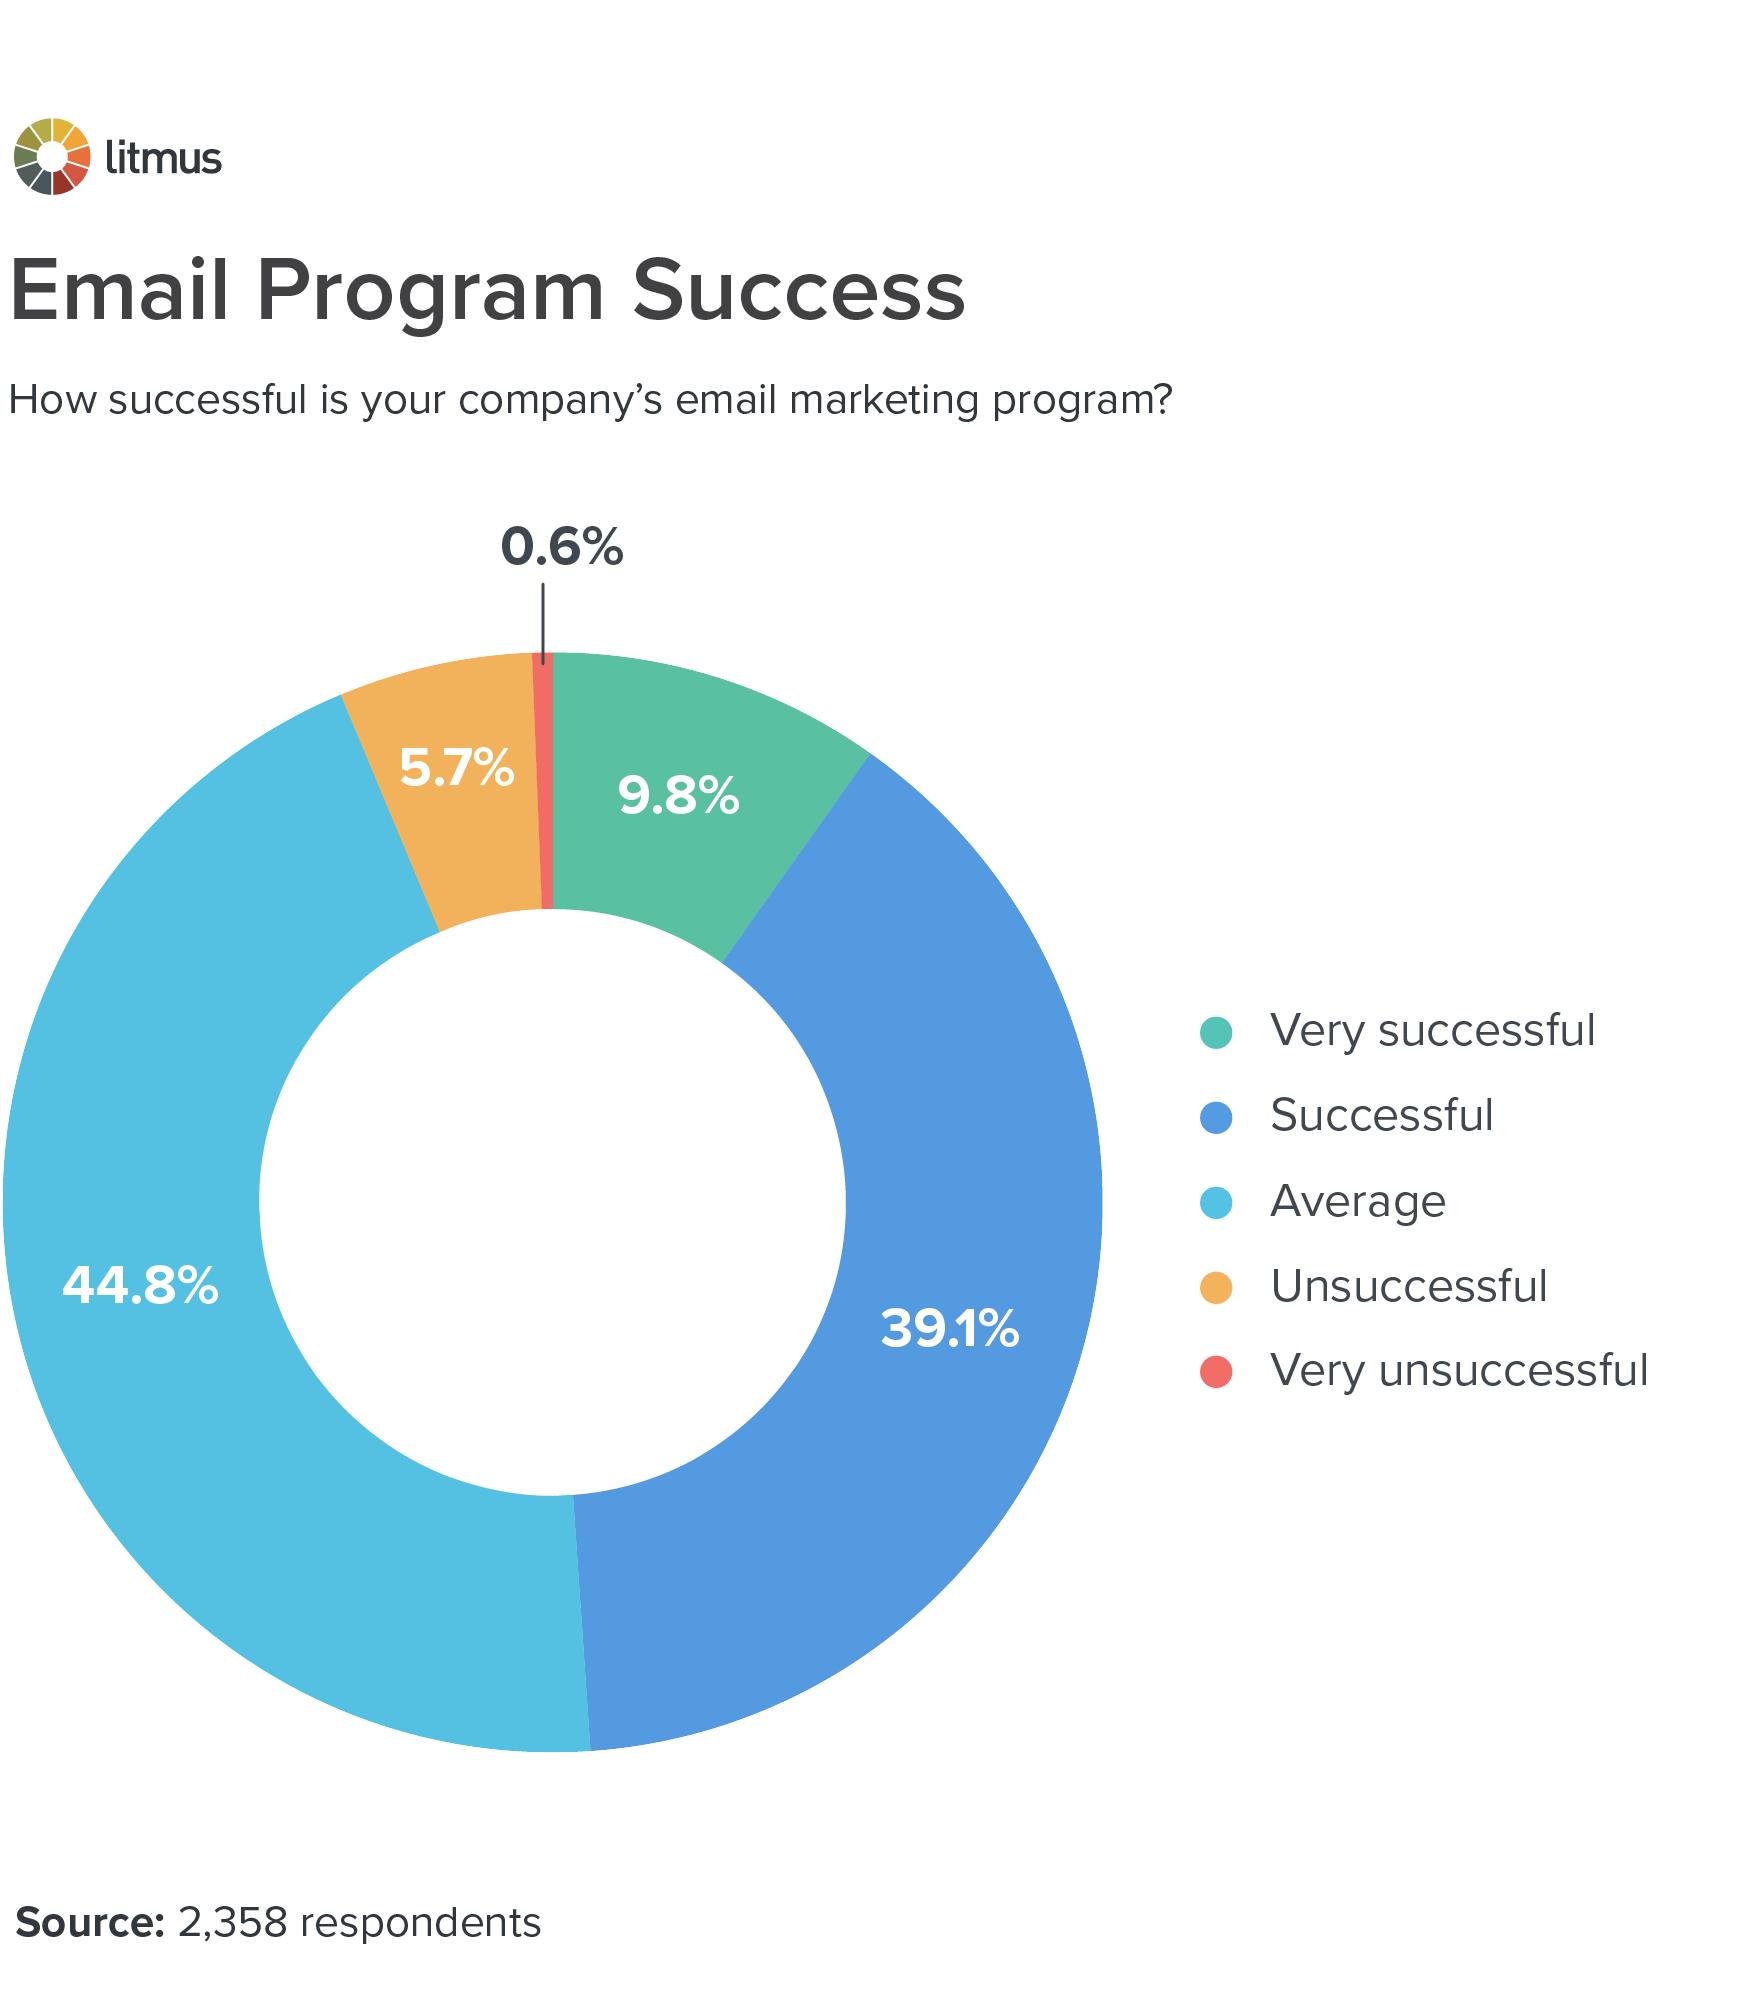 Email Program Success